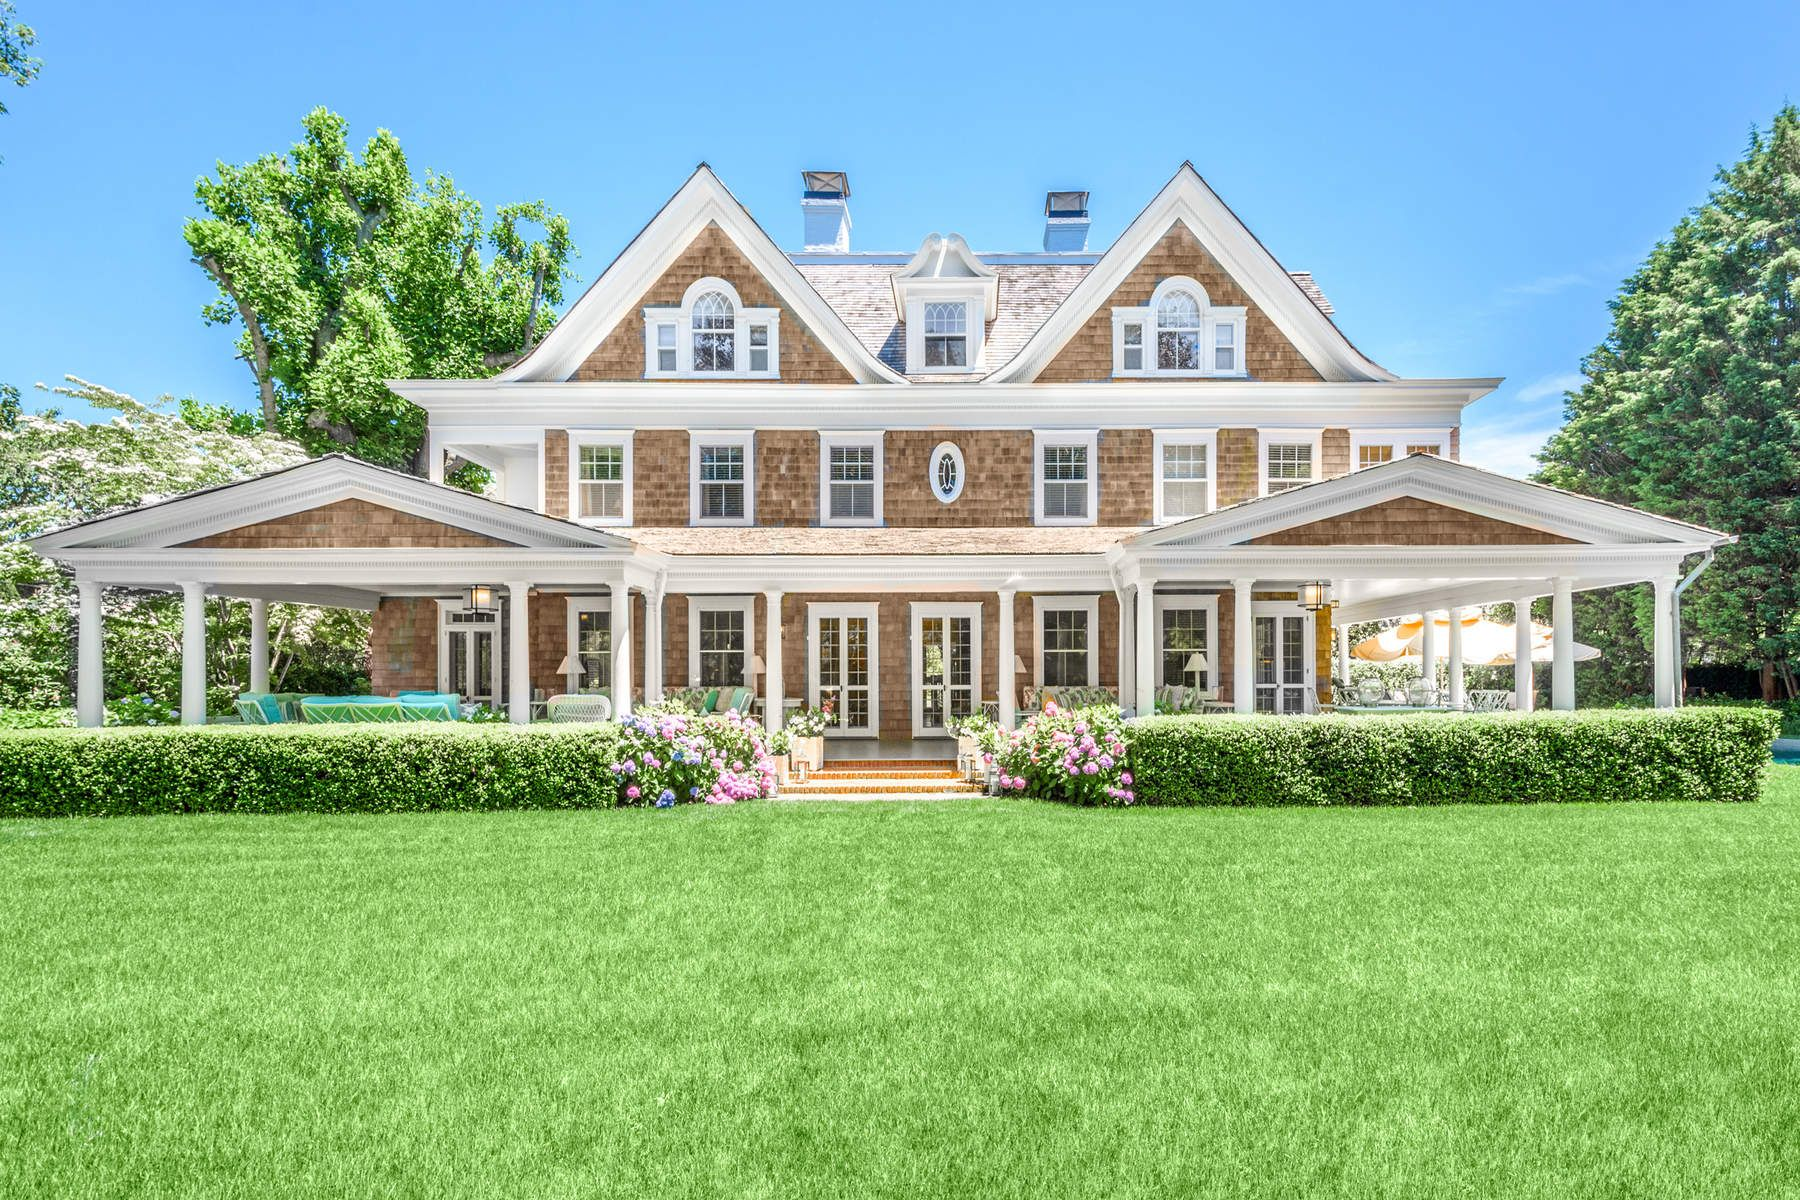 Single Family Home for Rent at Iconic Southampton Village Estate Southampton, New York 11968 United States